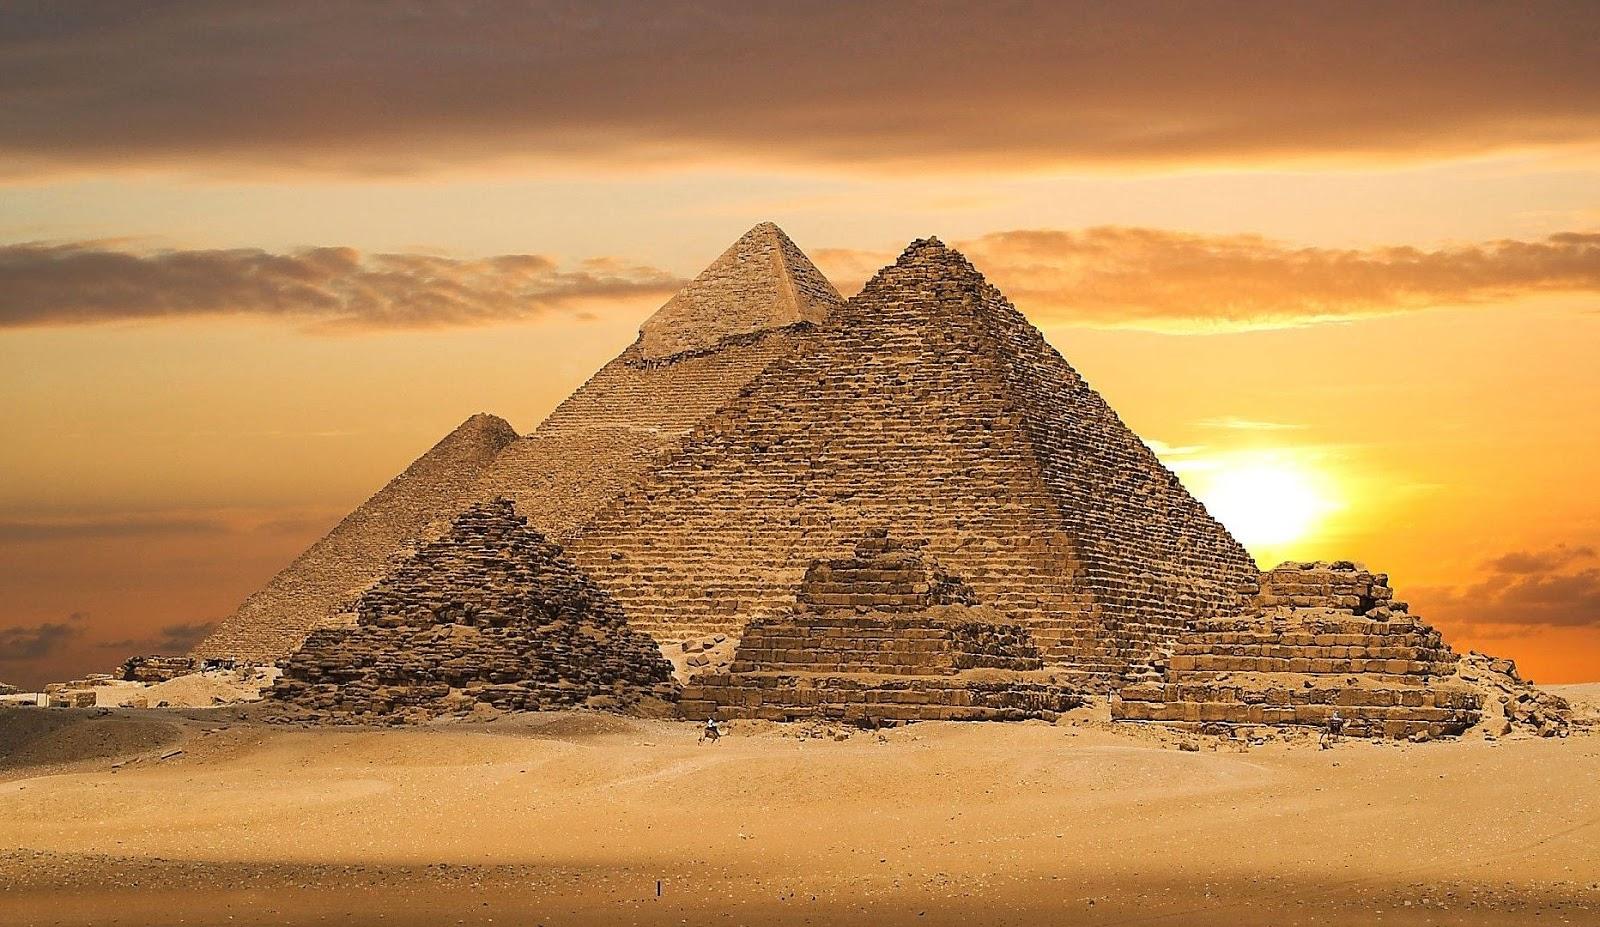 pyramid background - photo #20